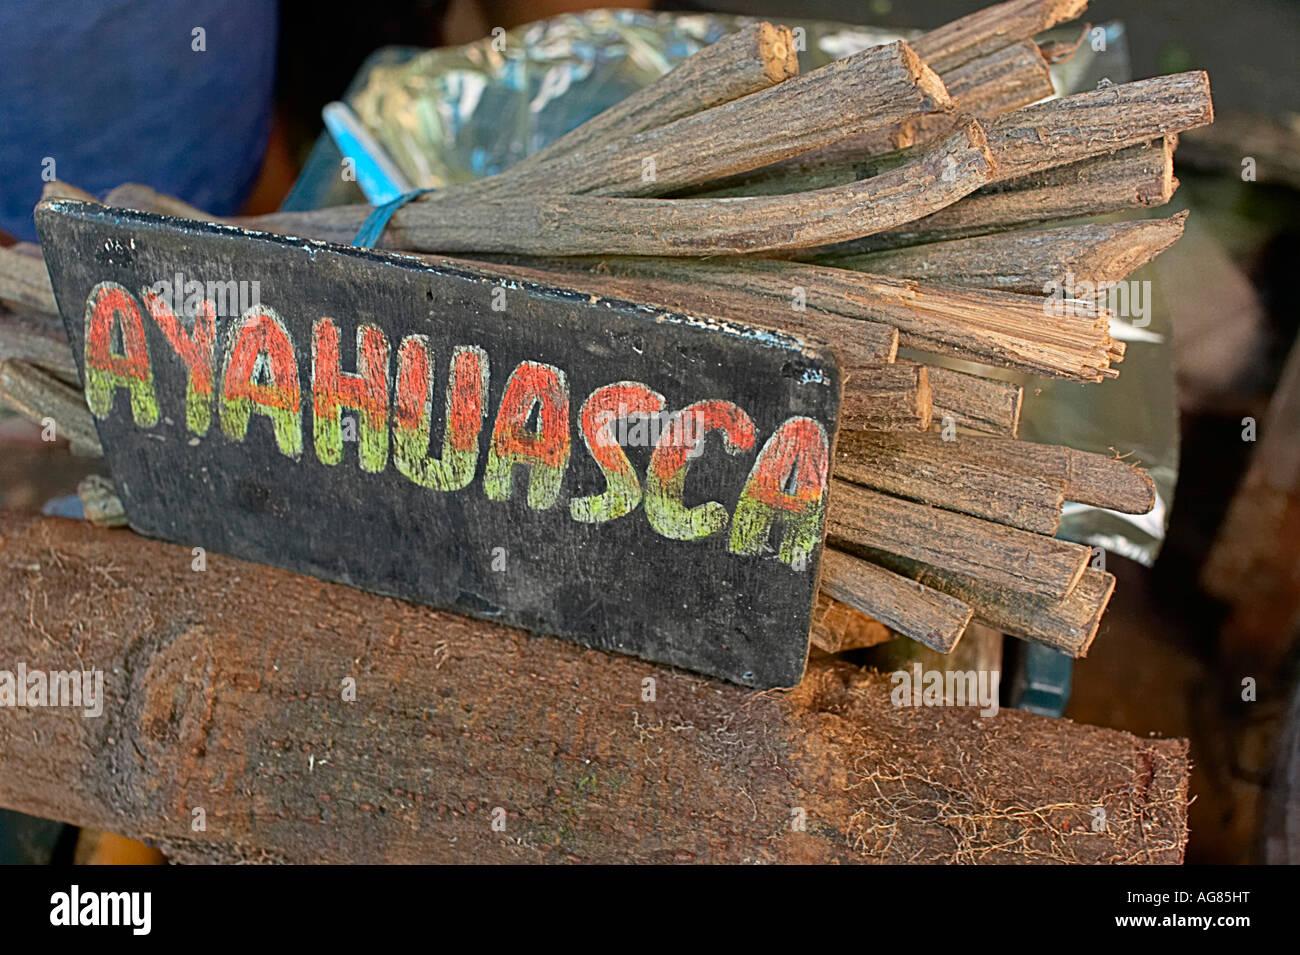 ayahuasca secos para la venta en el mercado de belem iquitos peru